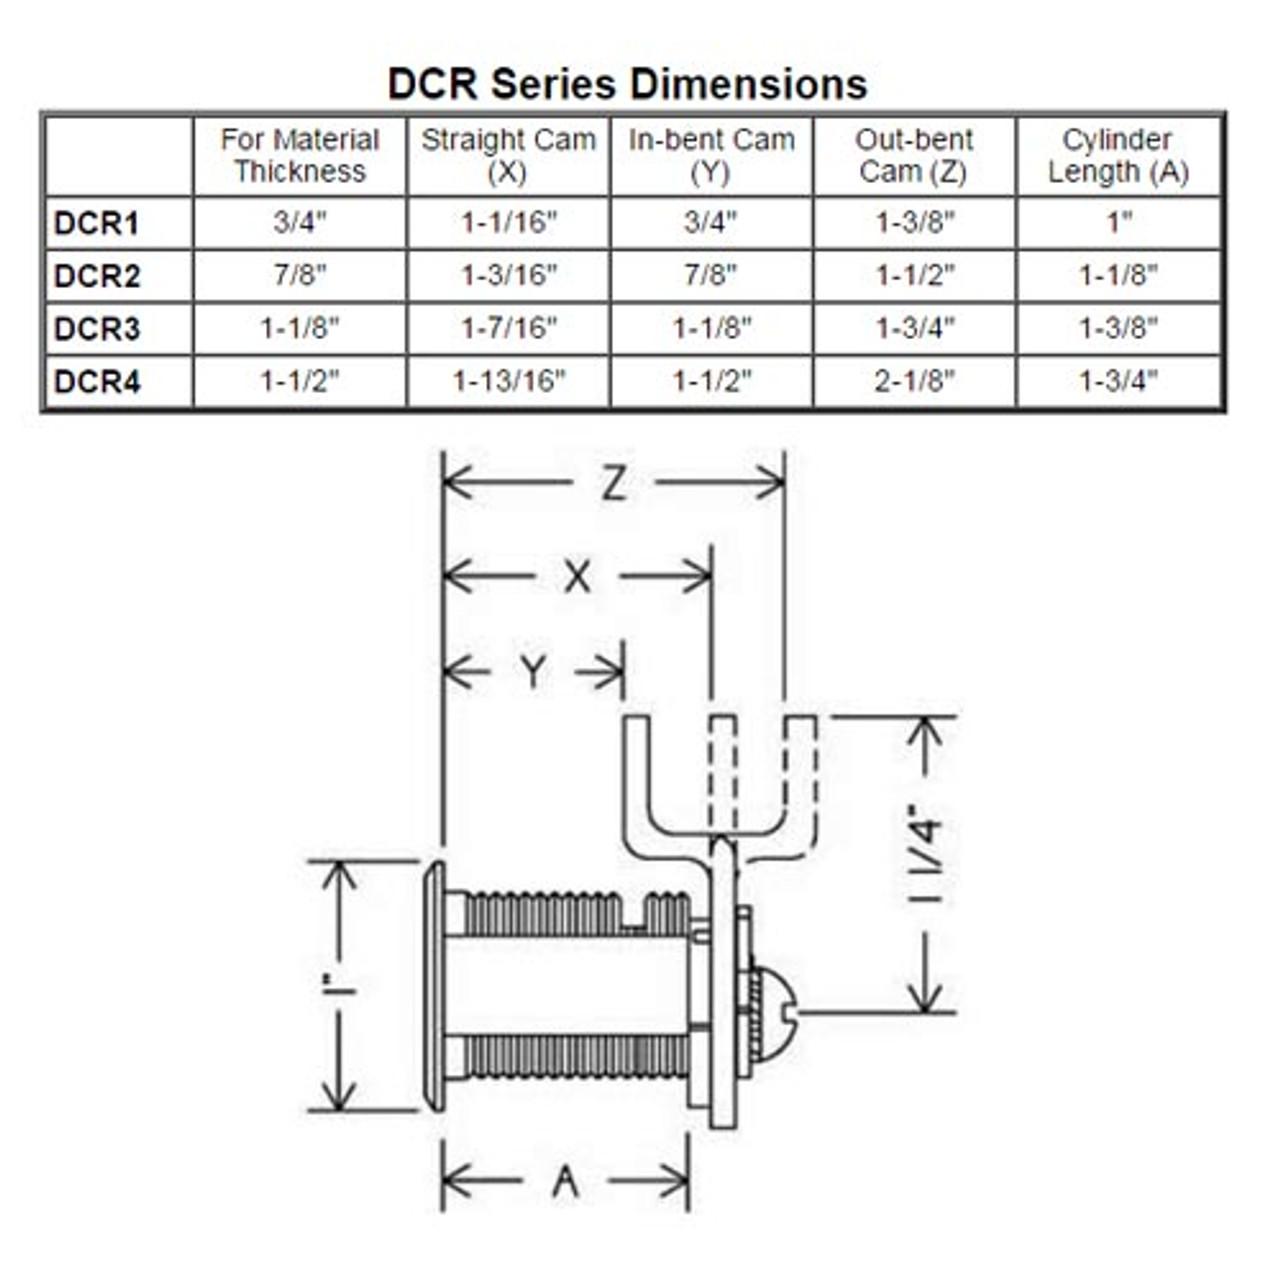 Olympus DCR2-KD-26D R Series Keyed Different Reversible Cam Lock in Satin Chrome